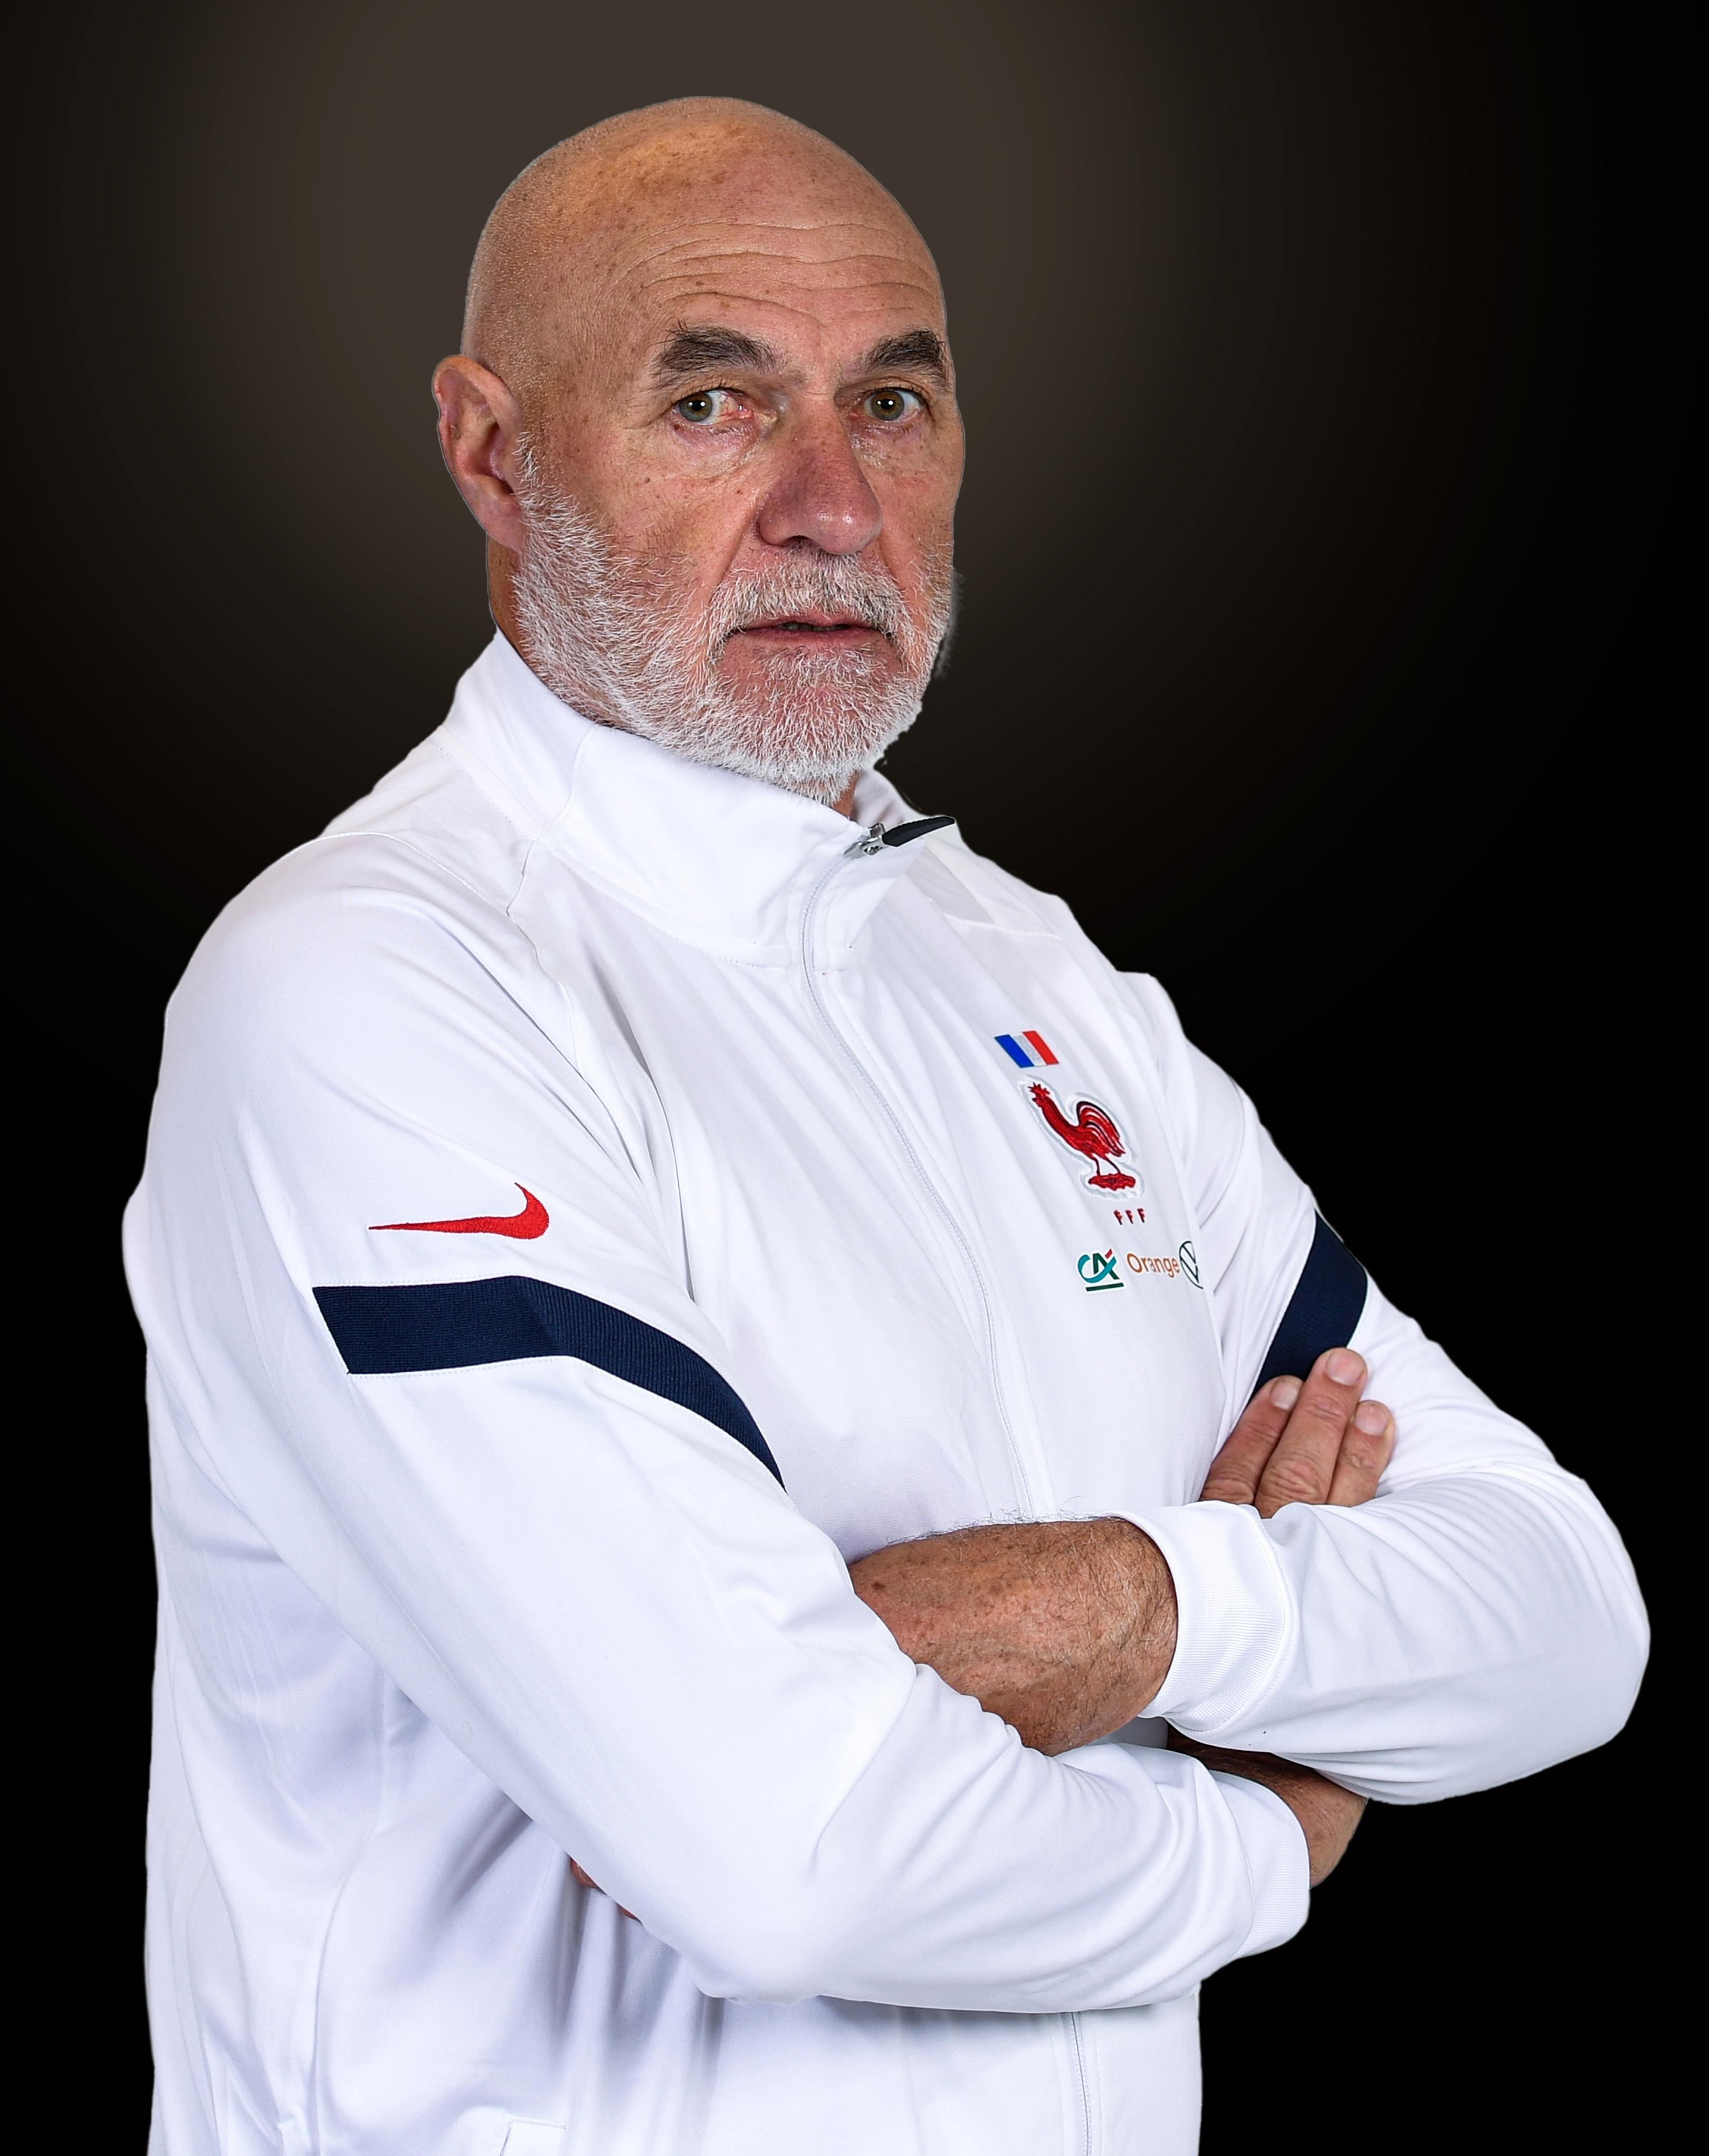 Patrick L'Hostis